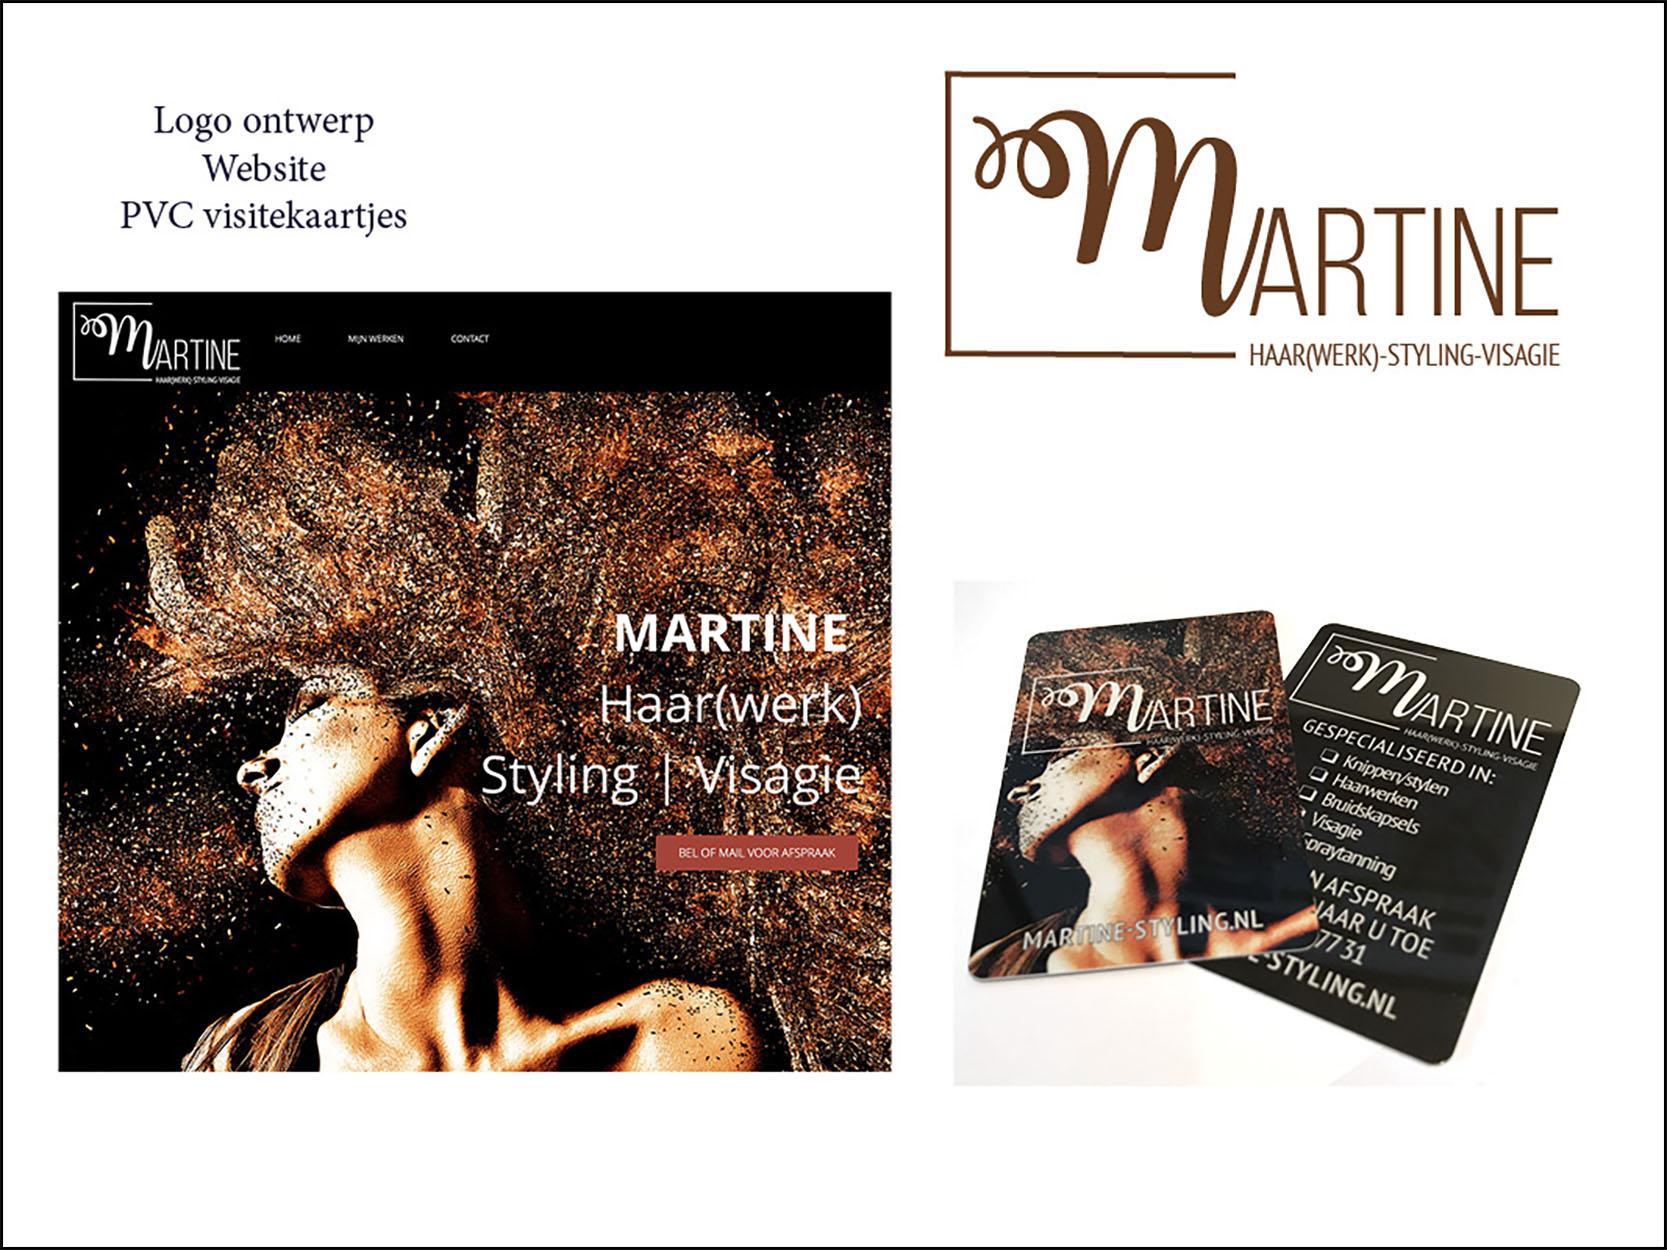 visitekaartjes logo ontwerp Martine-Styling